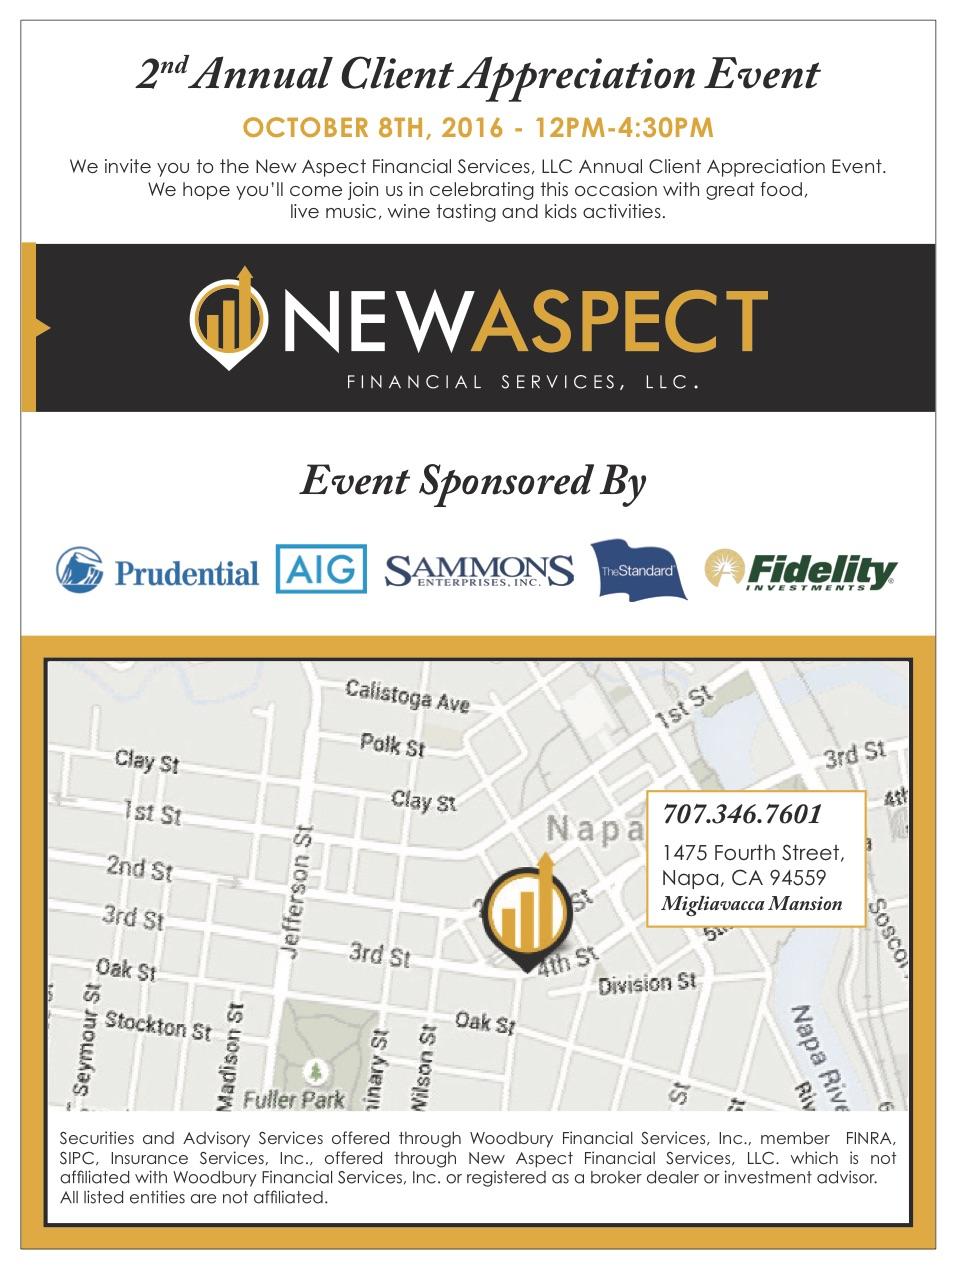 2nd Annual Client Appreciation Event Invitation Oct 8th New